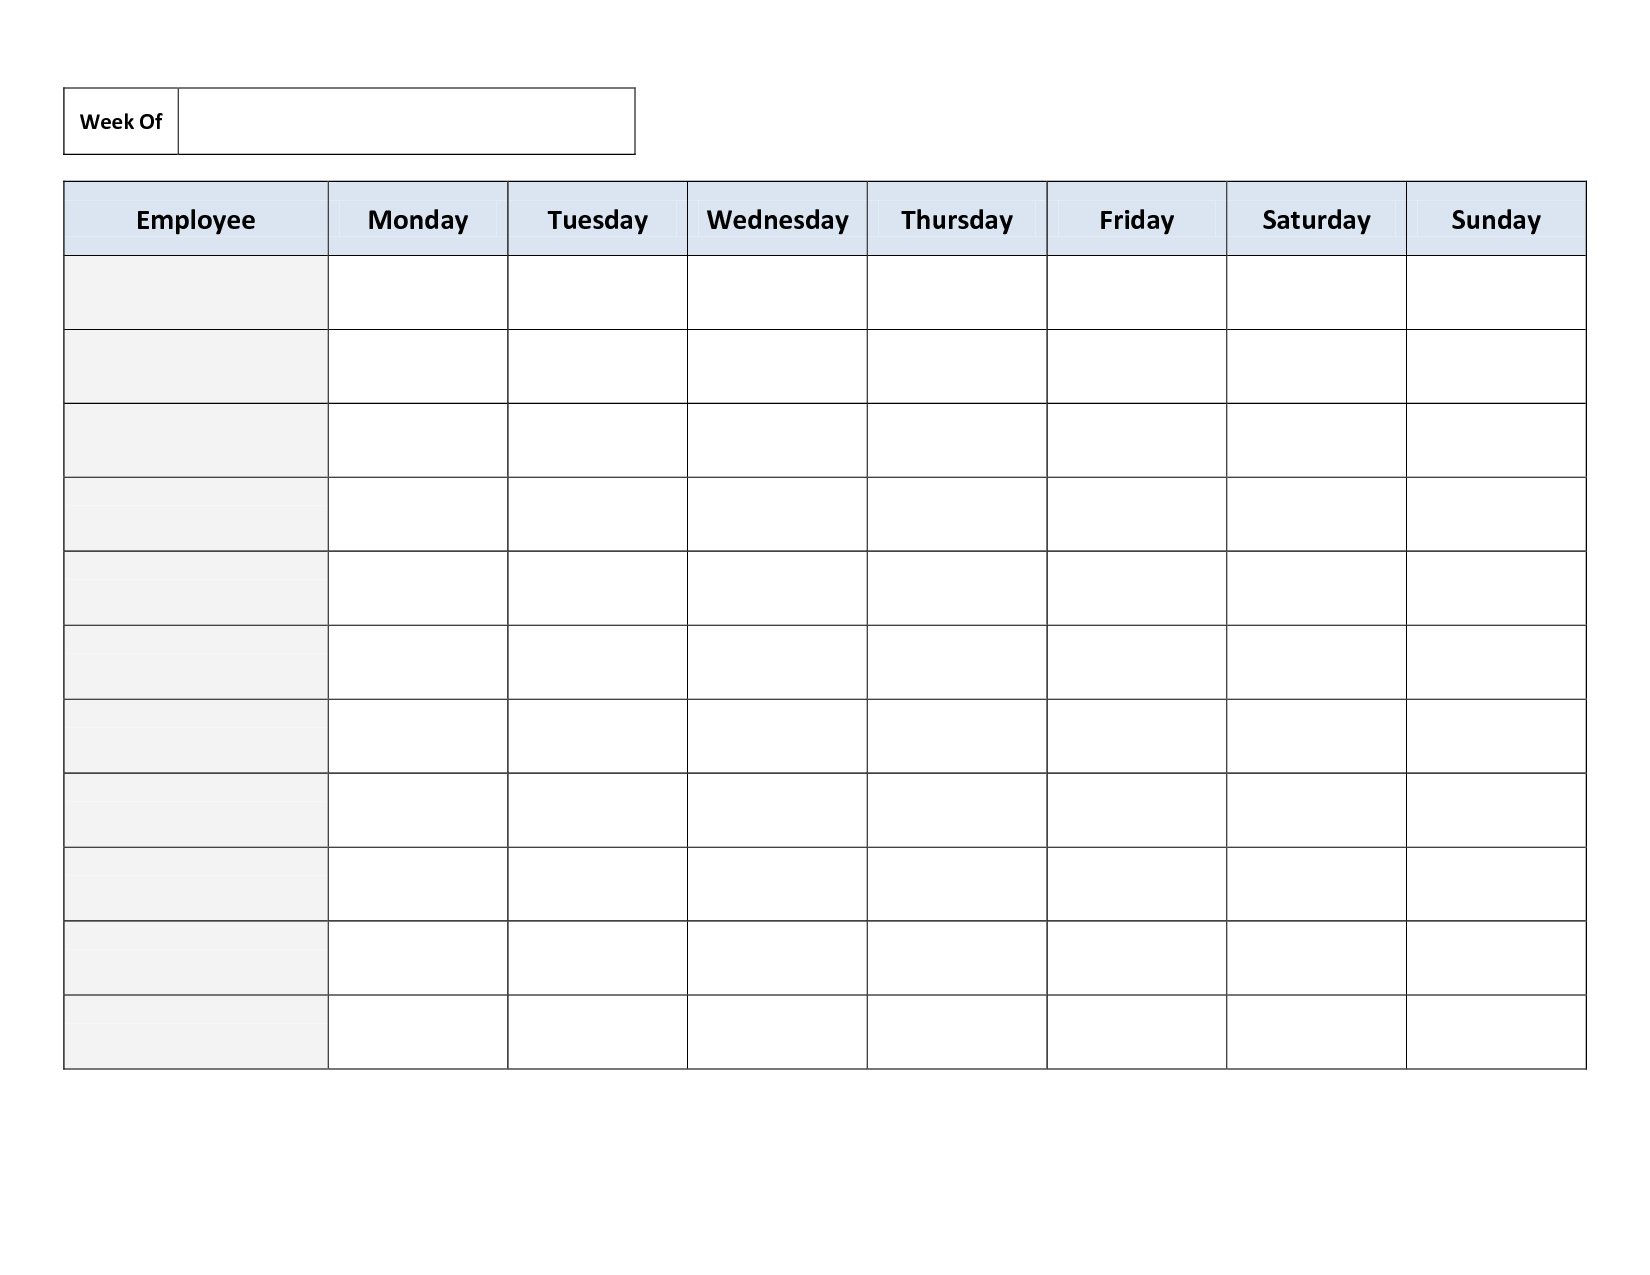 Blank Weekly Work Schedule Template | Schedule | Cleaning